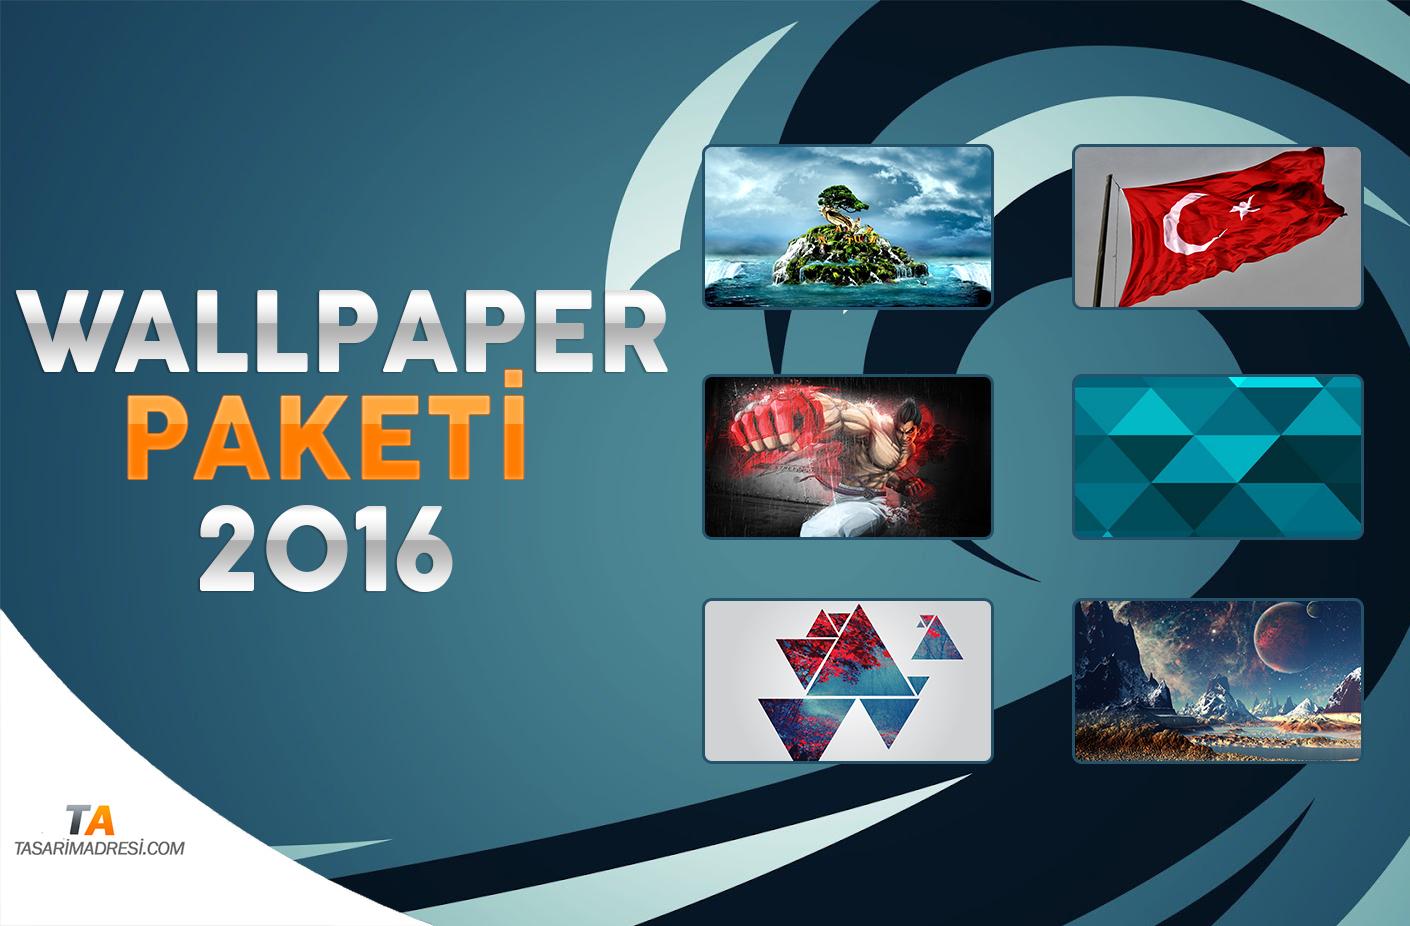 Photoshop wallpaper paketi 2016, photoshop paket, wallpaper paketi, indir